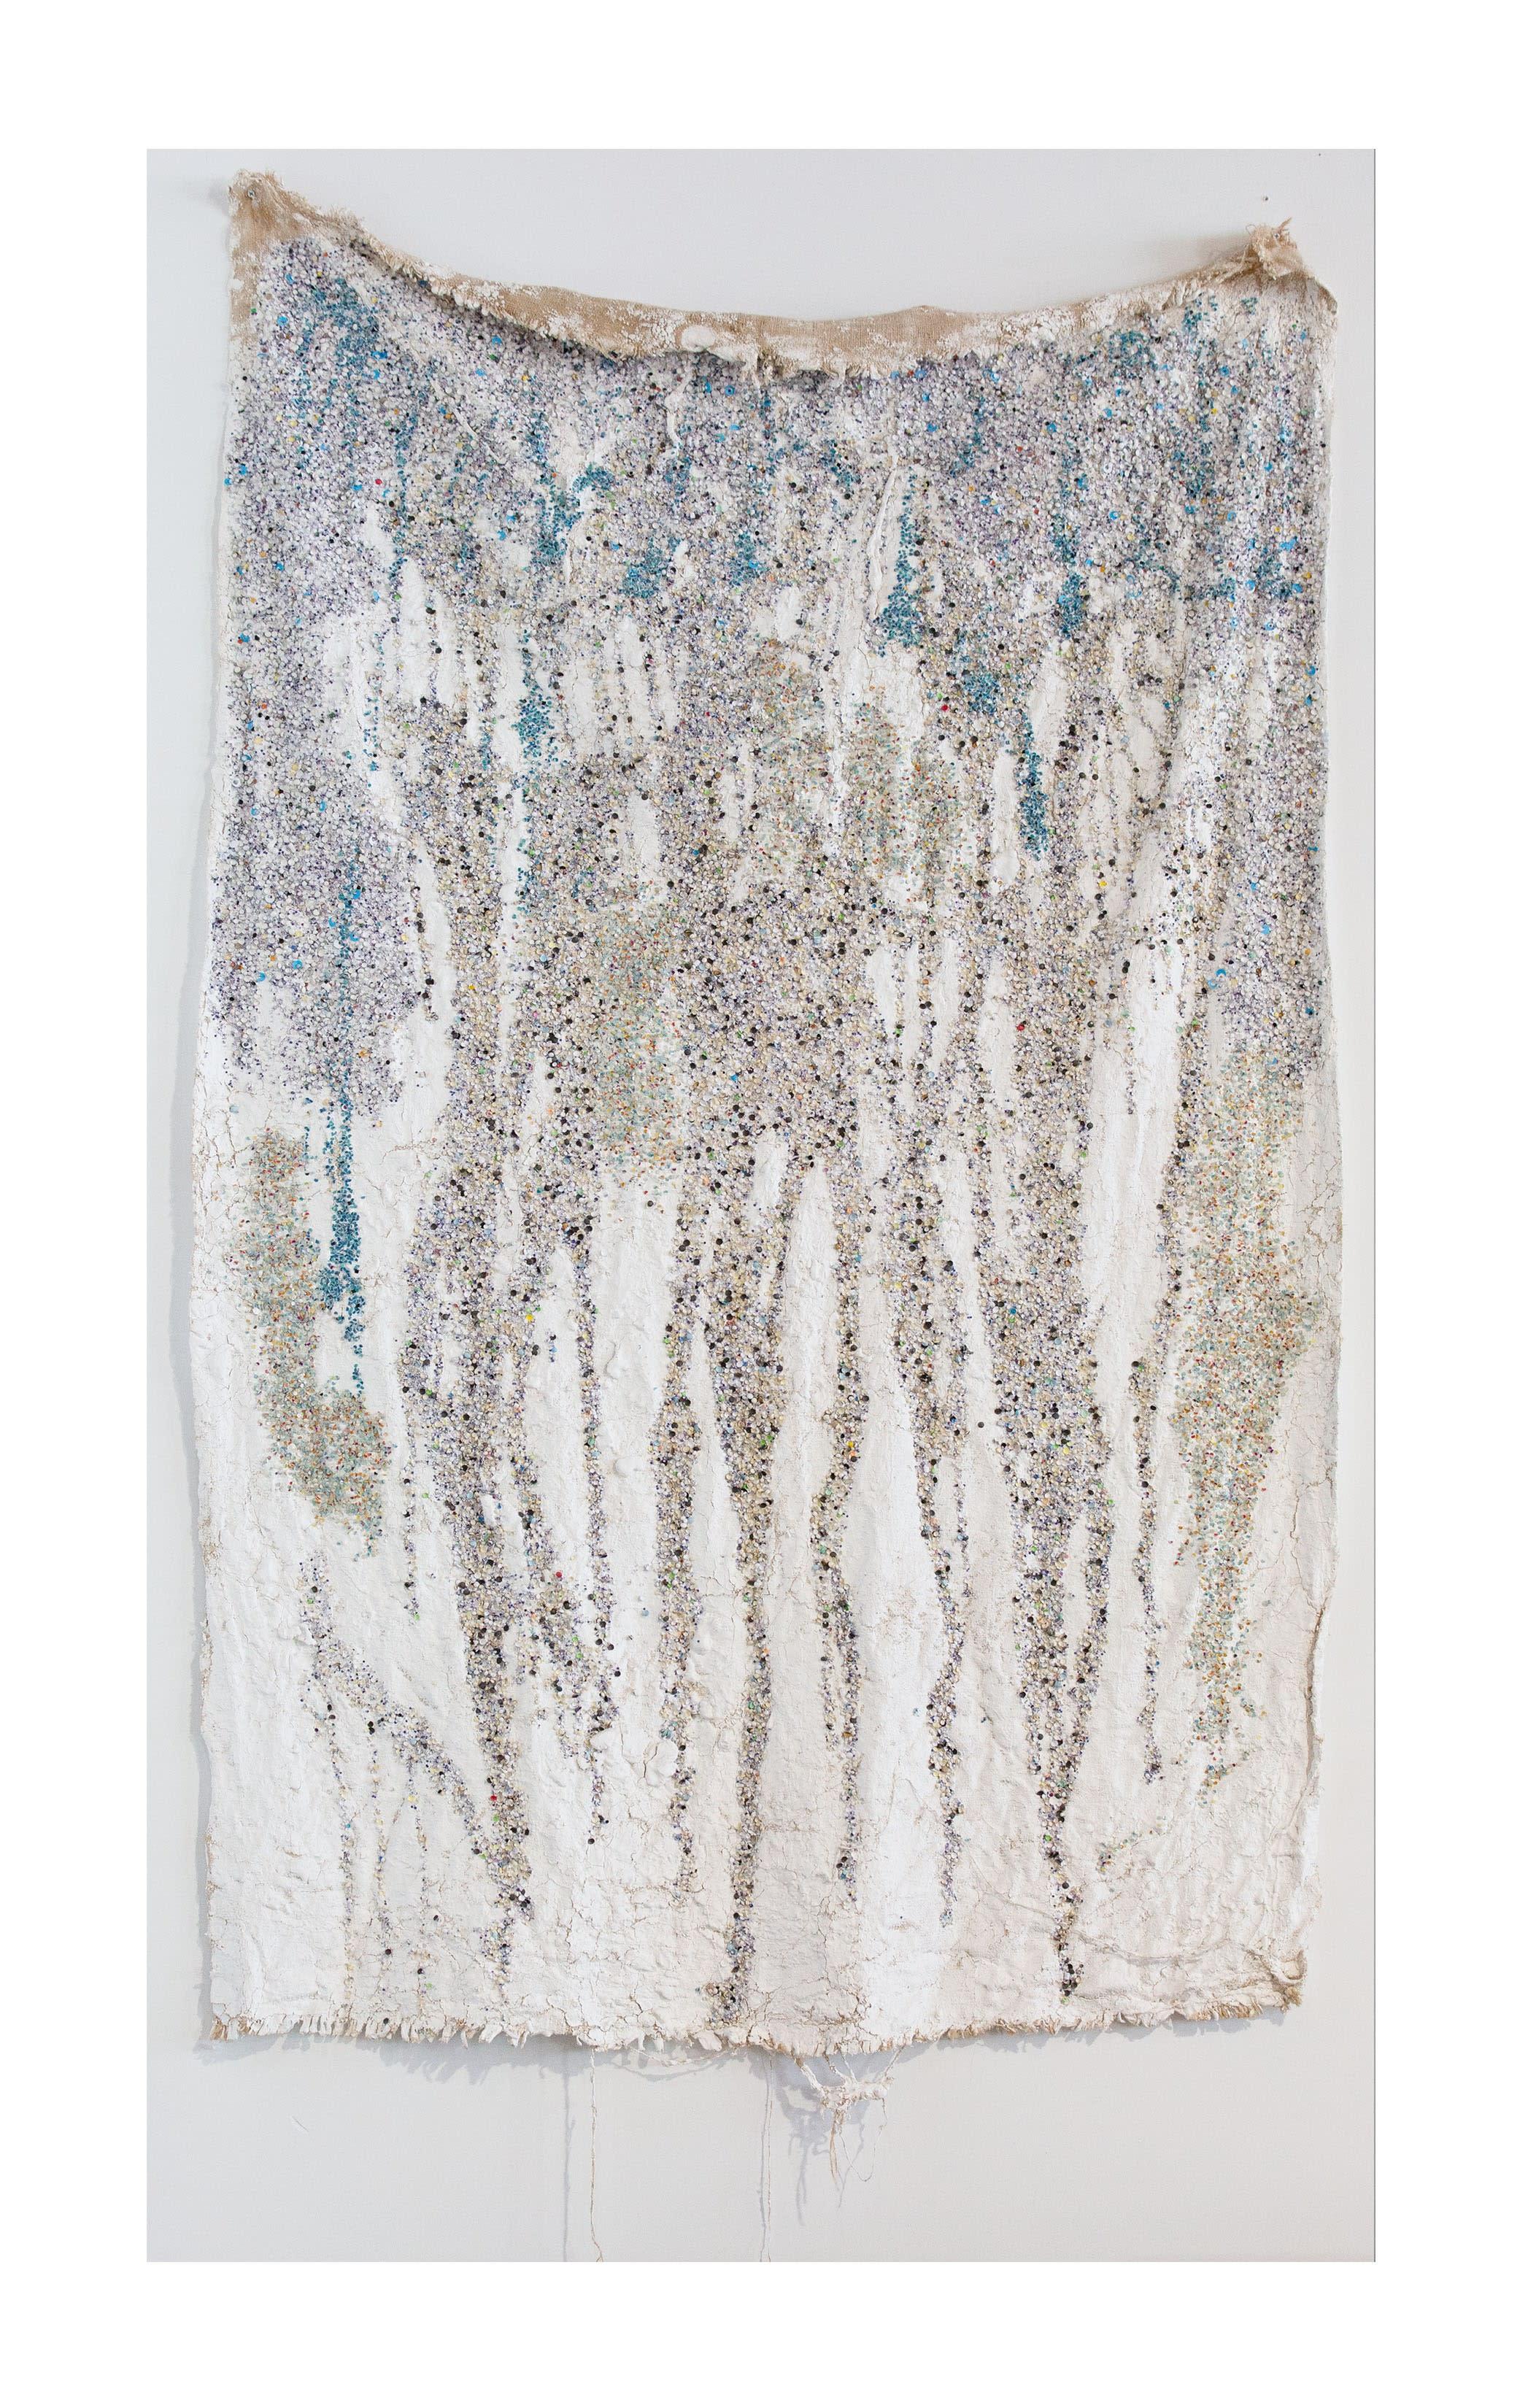 Valincy-Jean Patelli, Untitled (Yemaya y Oshun) 2018